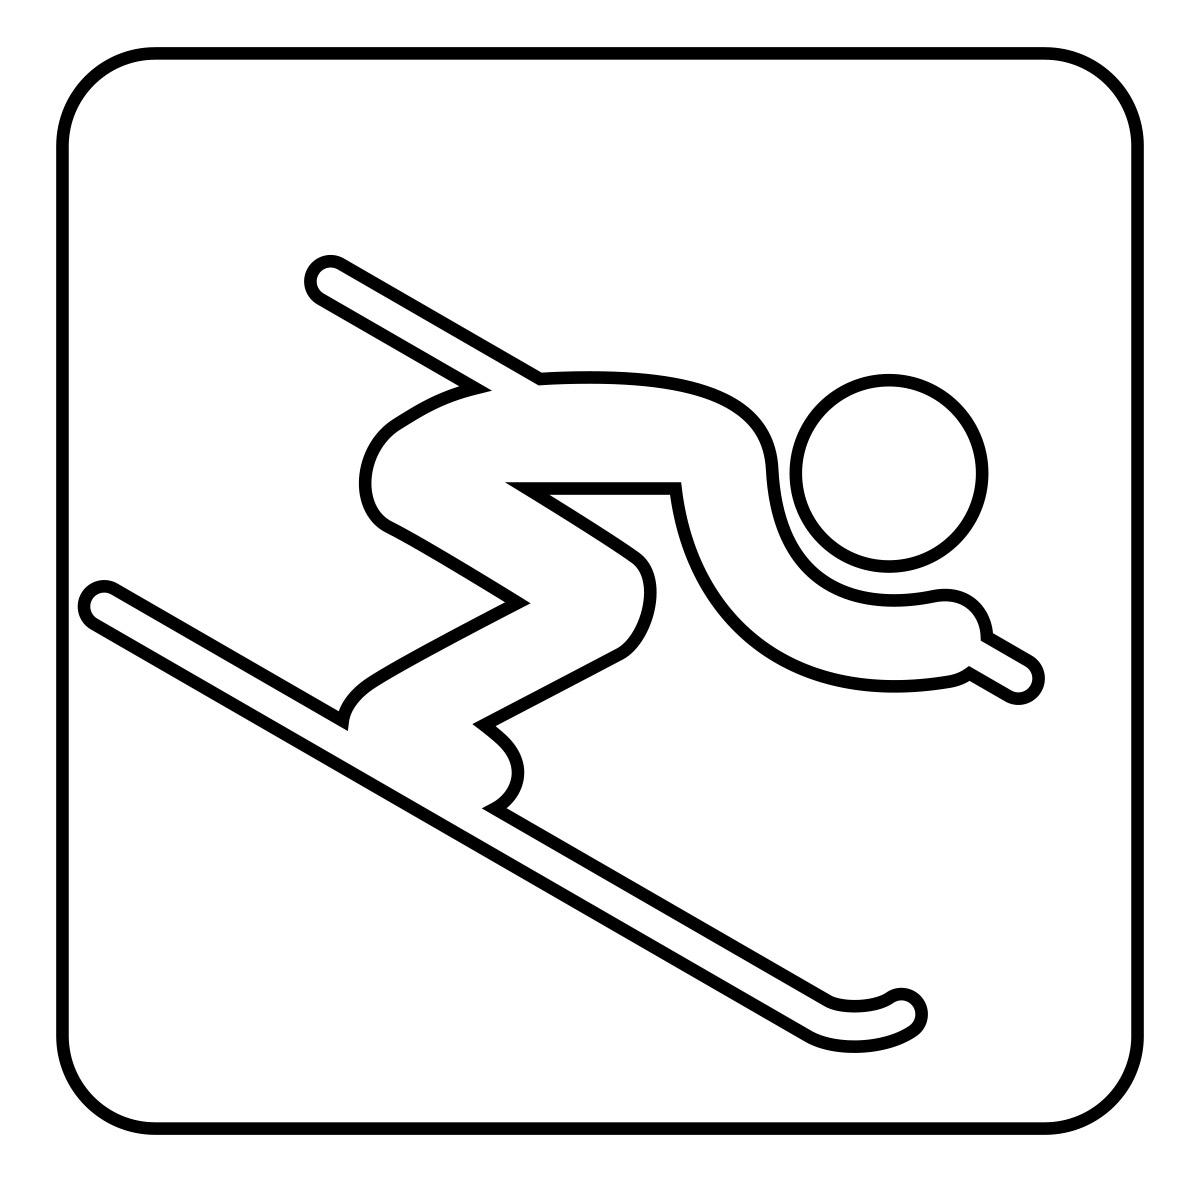 Clip Art: Sochi Winter Olympics Graphic Icon of Bobsleigh.